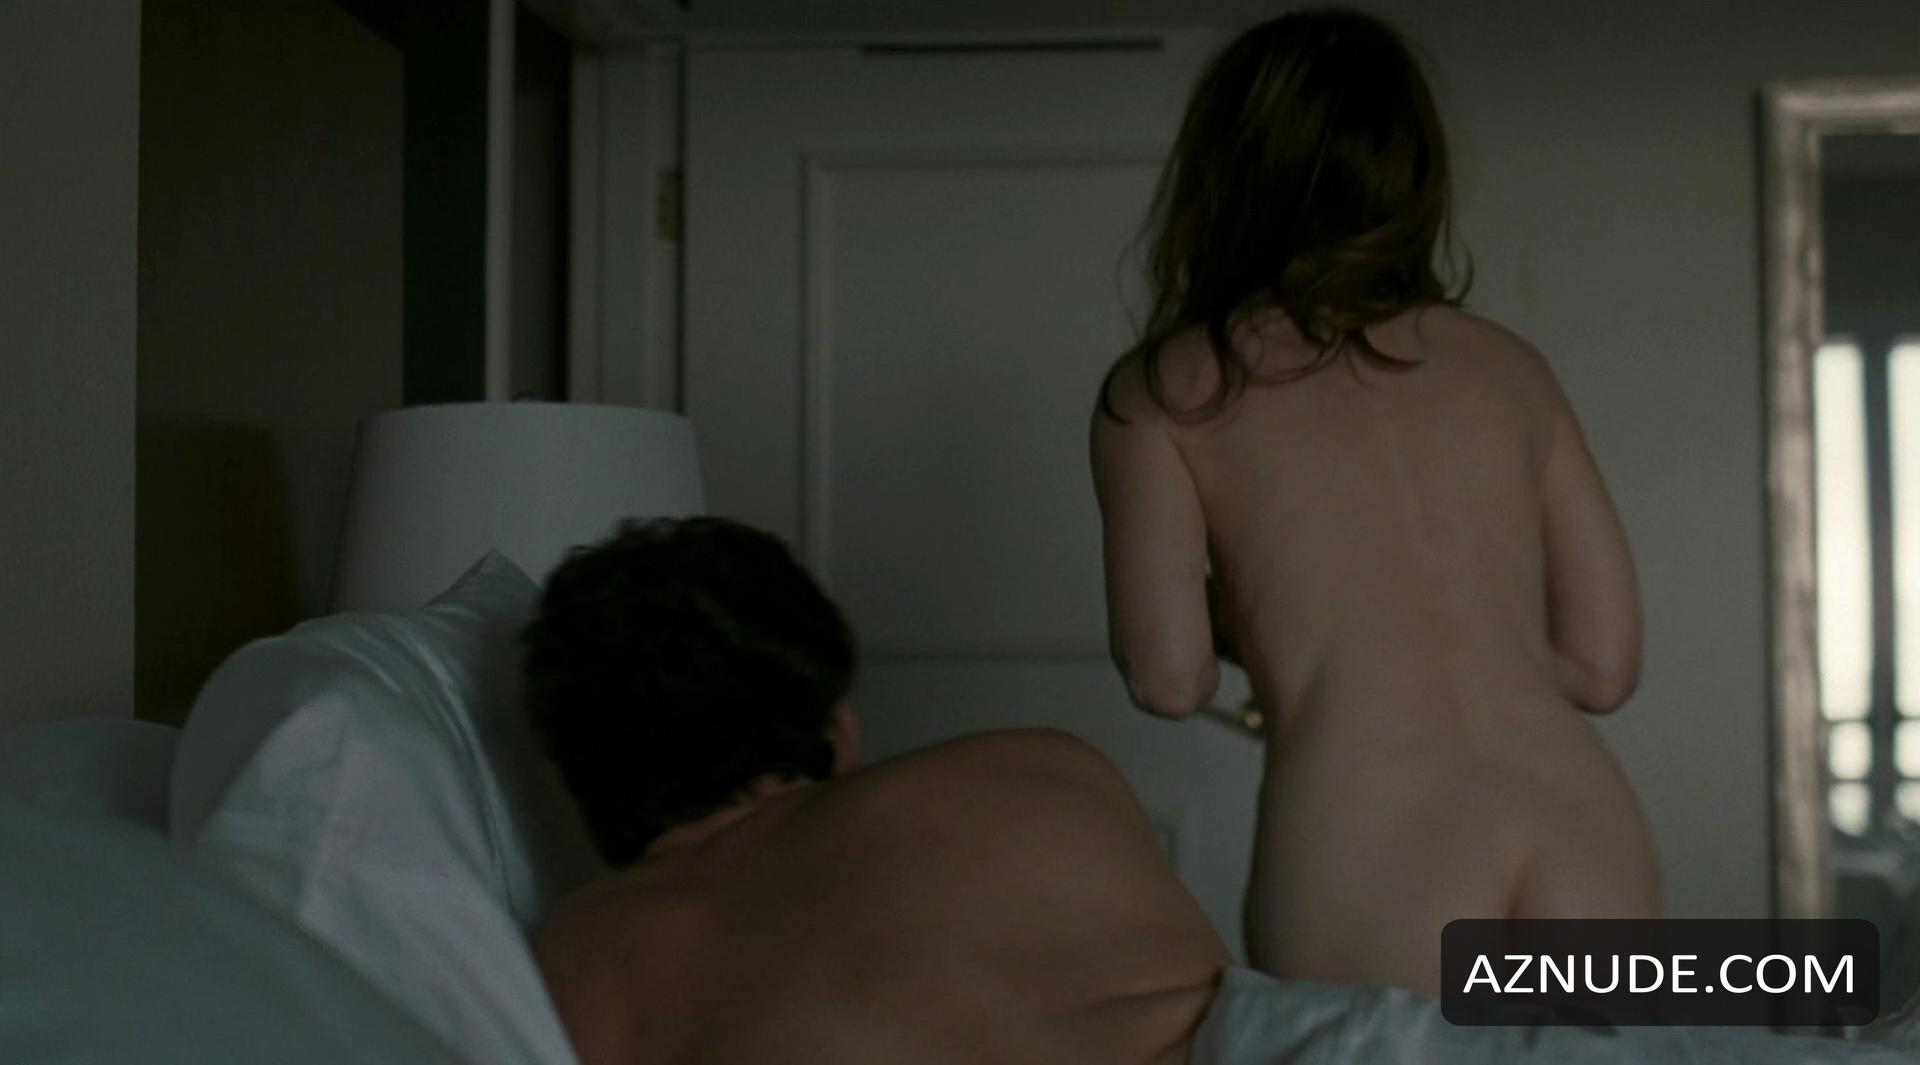 Nude men club ft lauderdale